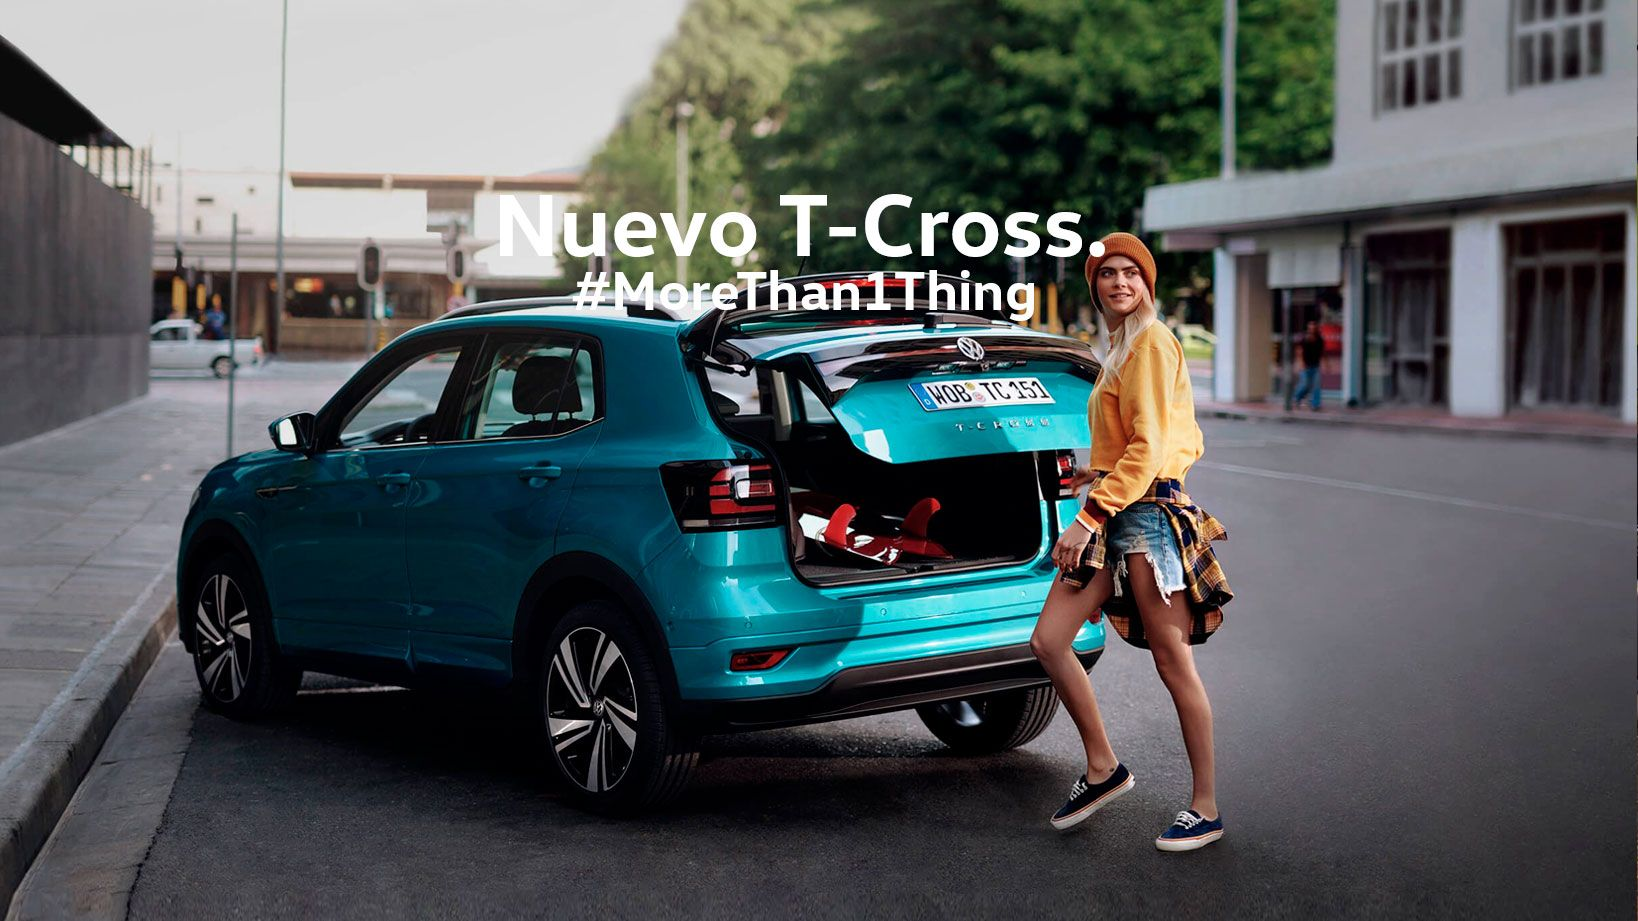 NUEVO T-CROSS